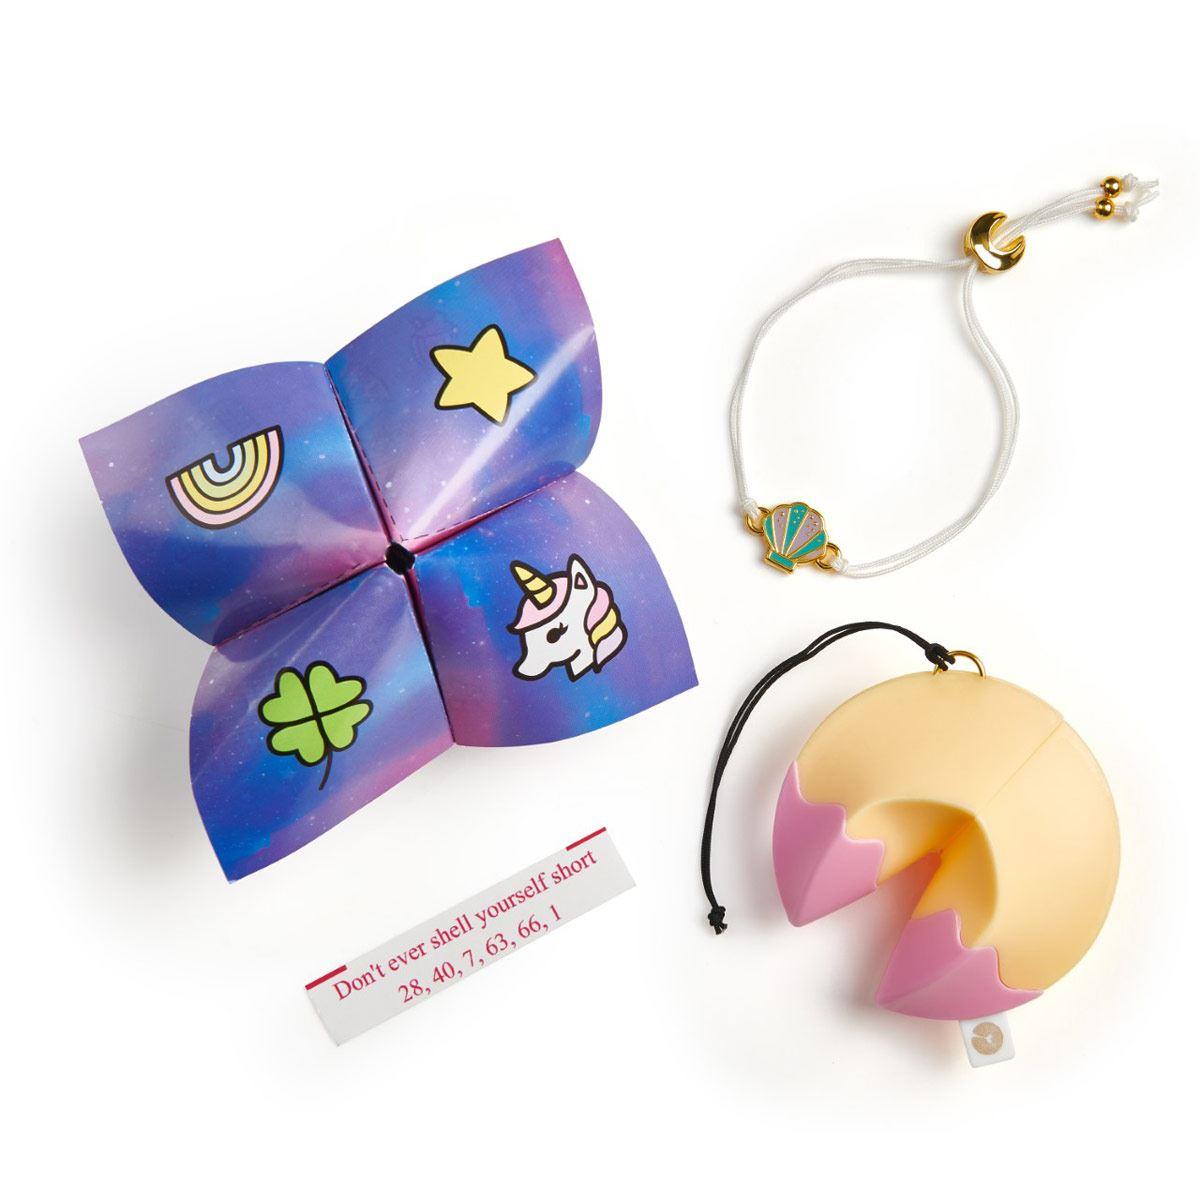 Galleta de la suerte Lucky Fortune Foil bag